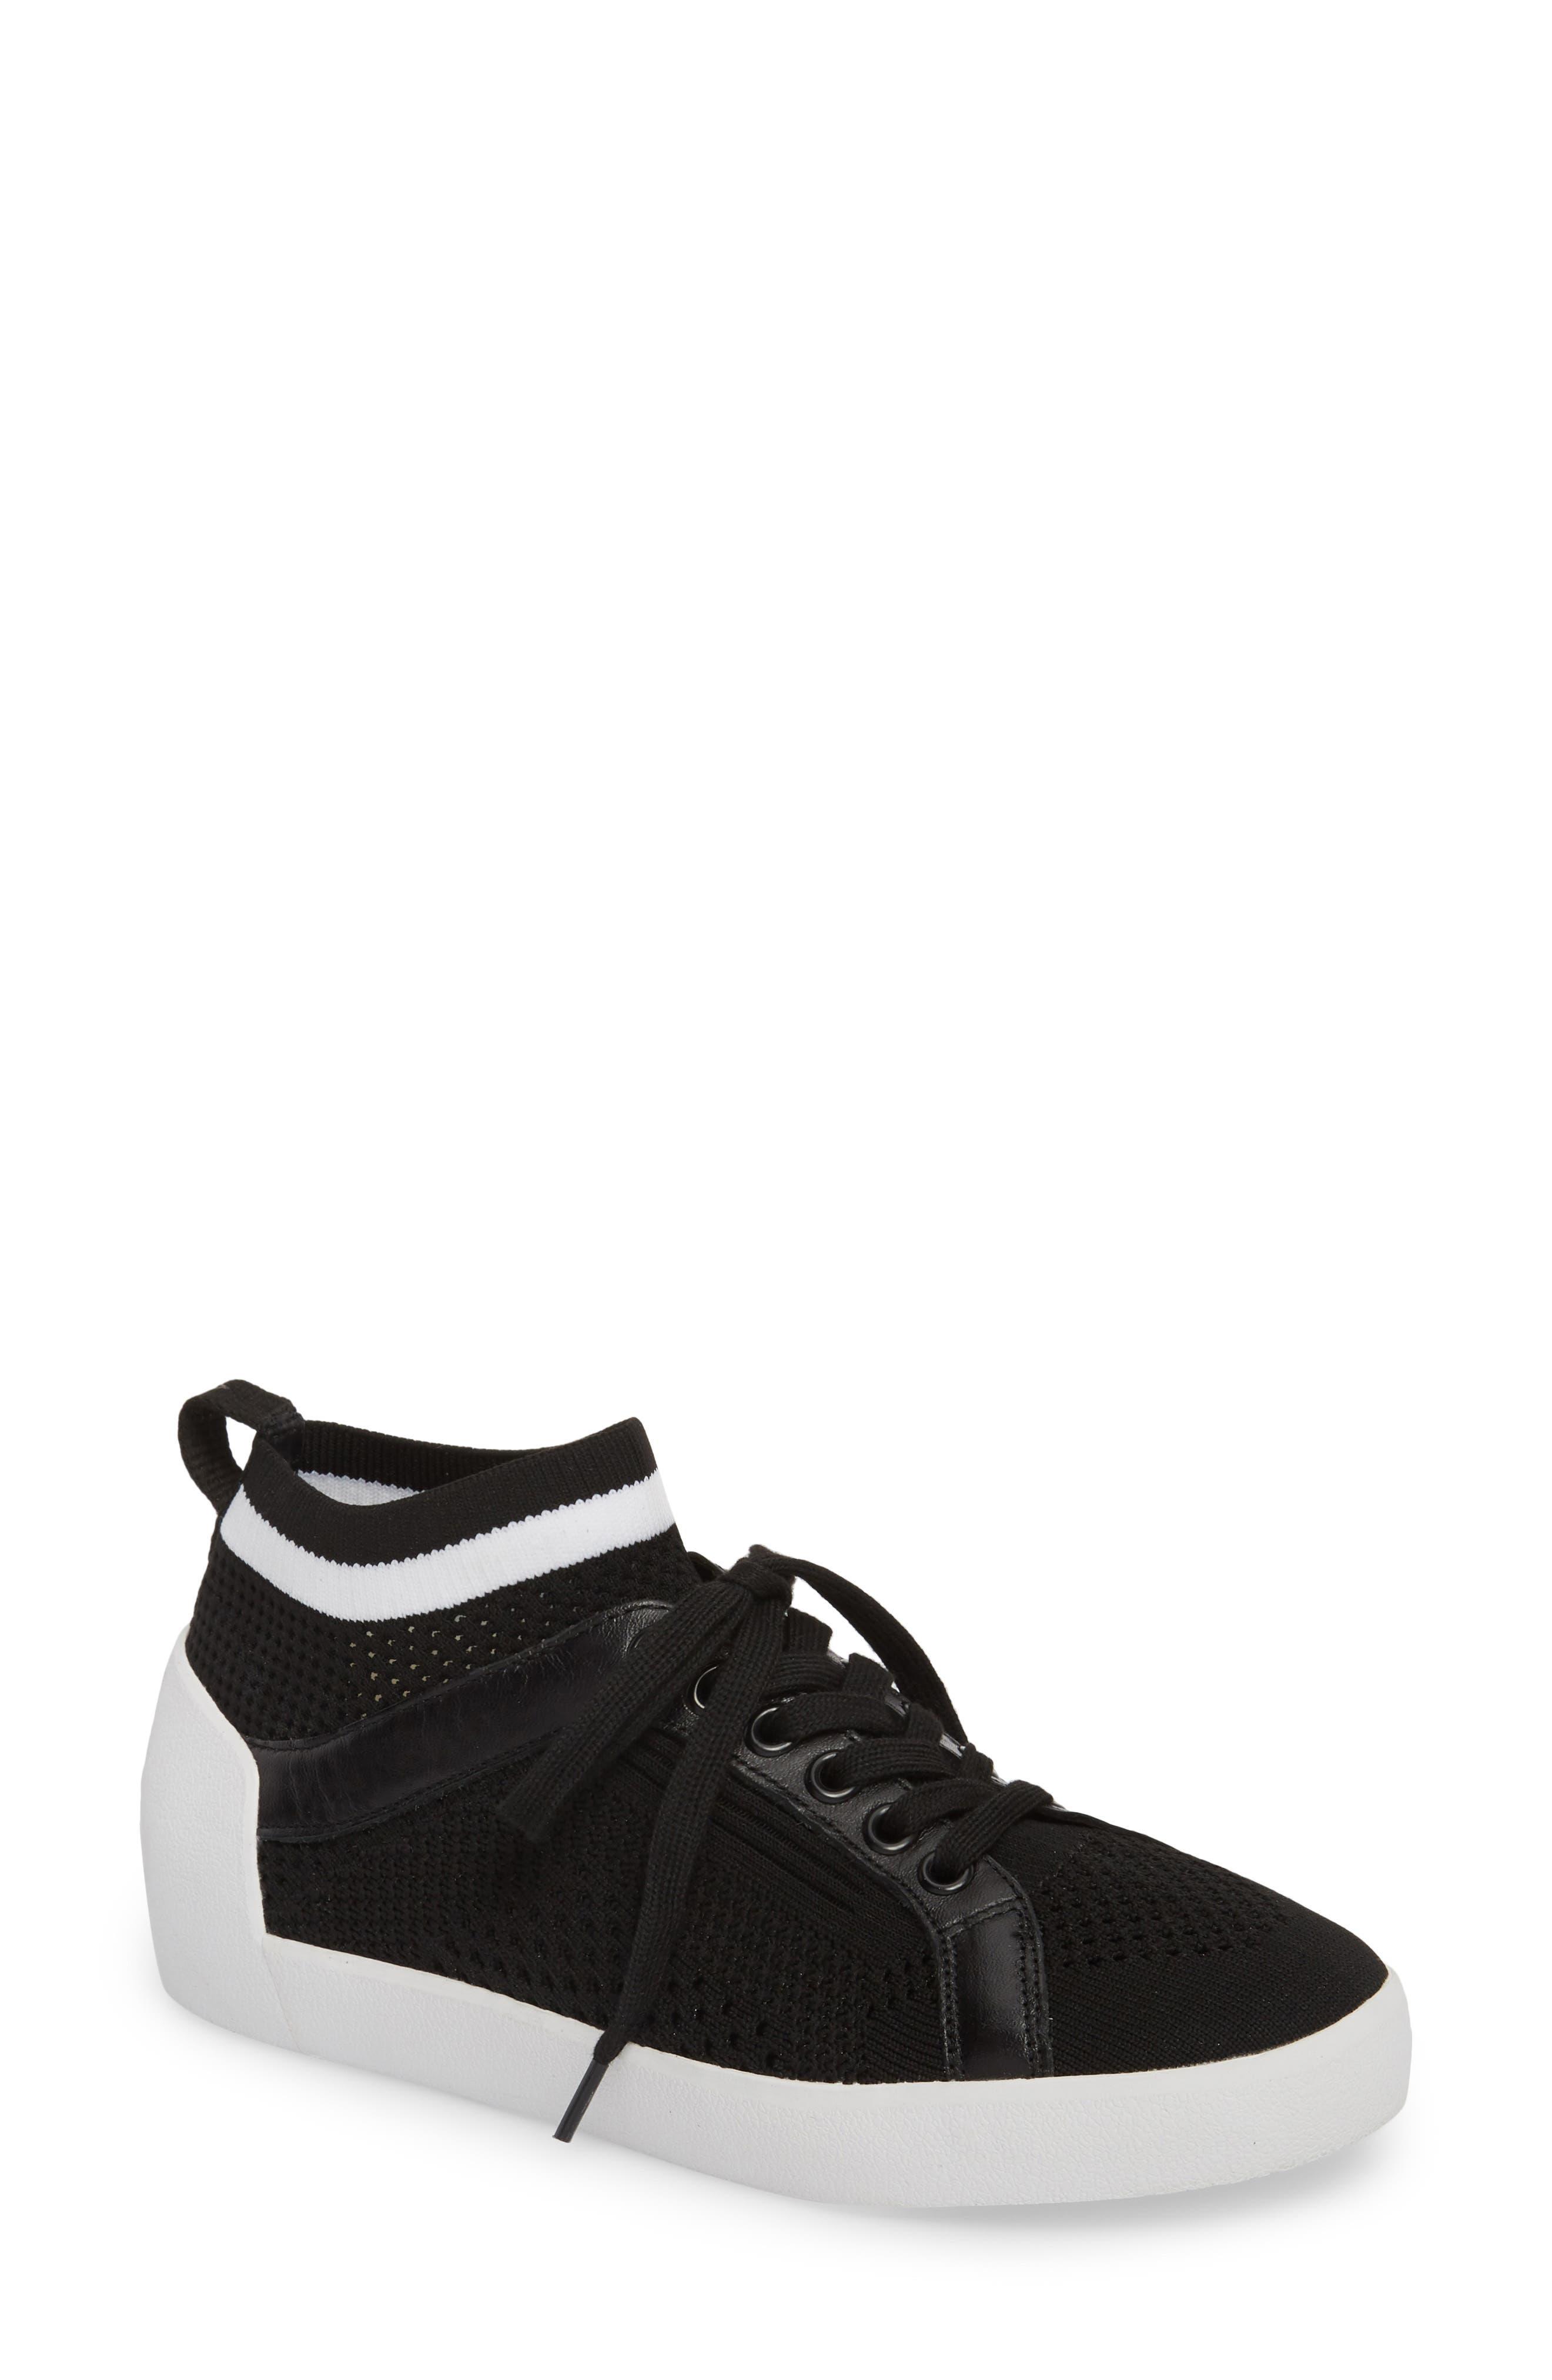 Nolita Mid Top Sock Sneaker,                             Main thumbnail 1, color,                             001